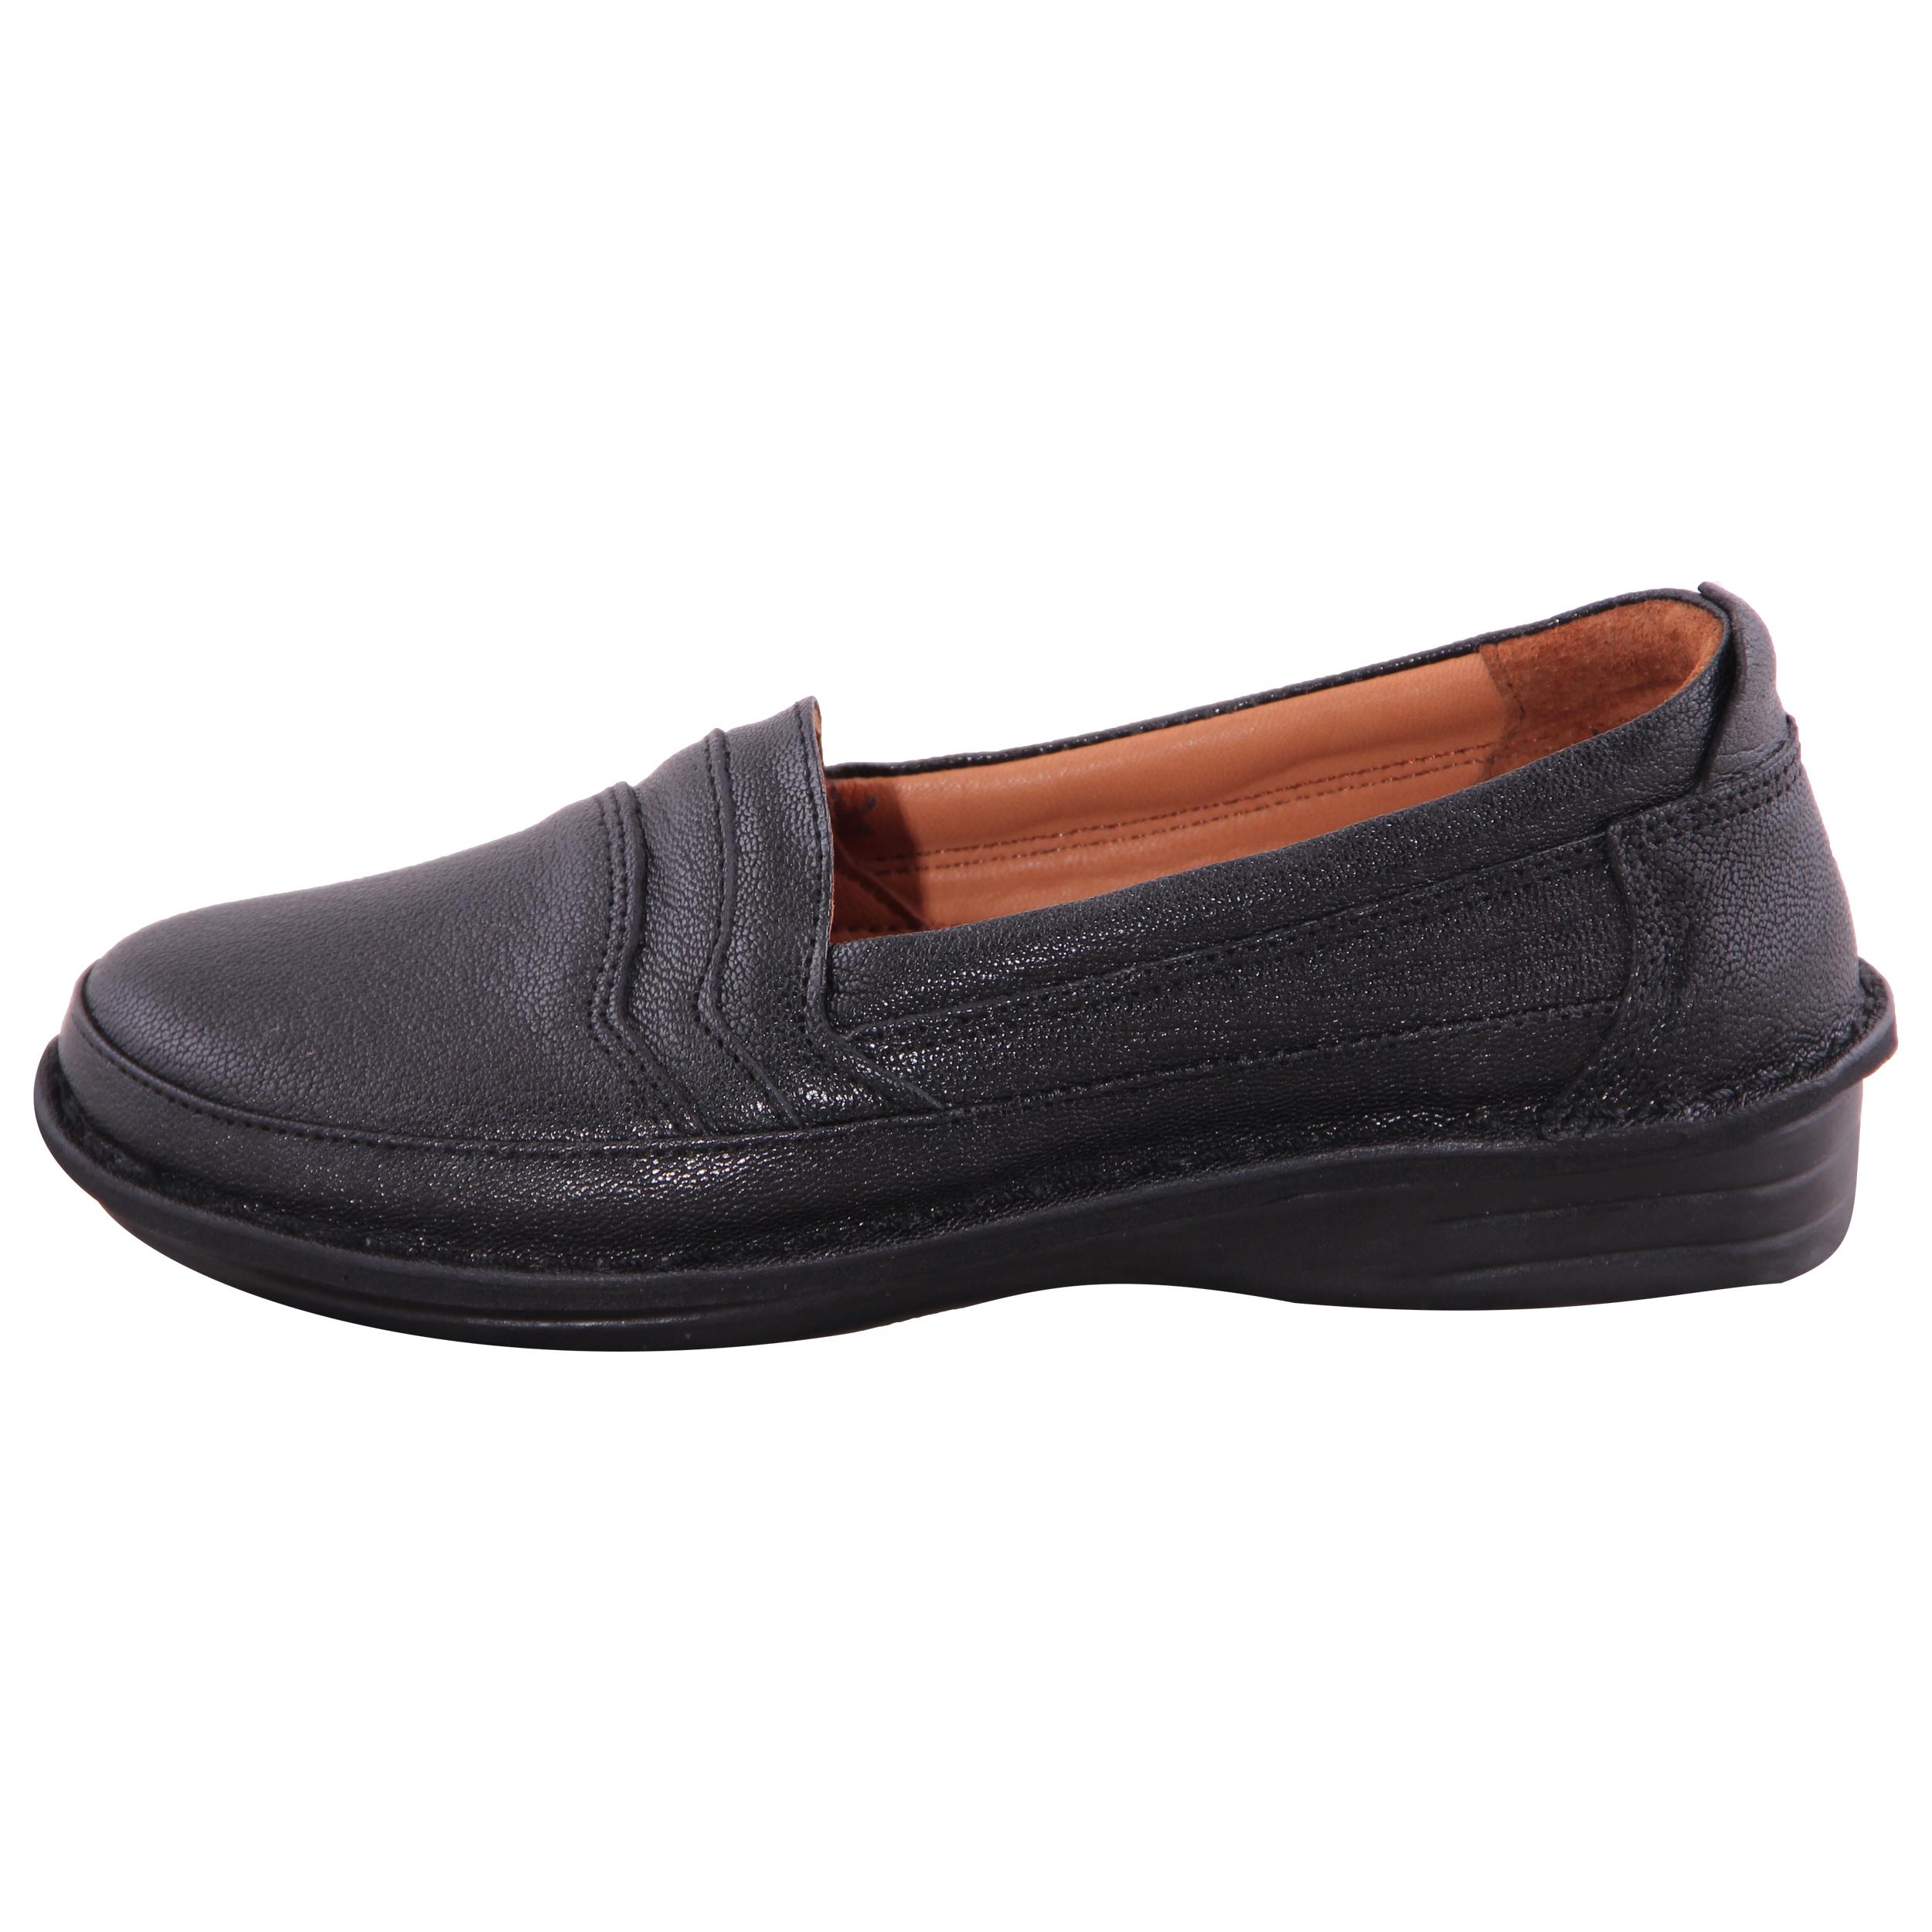 کفش روزمره زنانه شهر چرم مدل IR01014-1